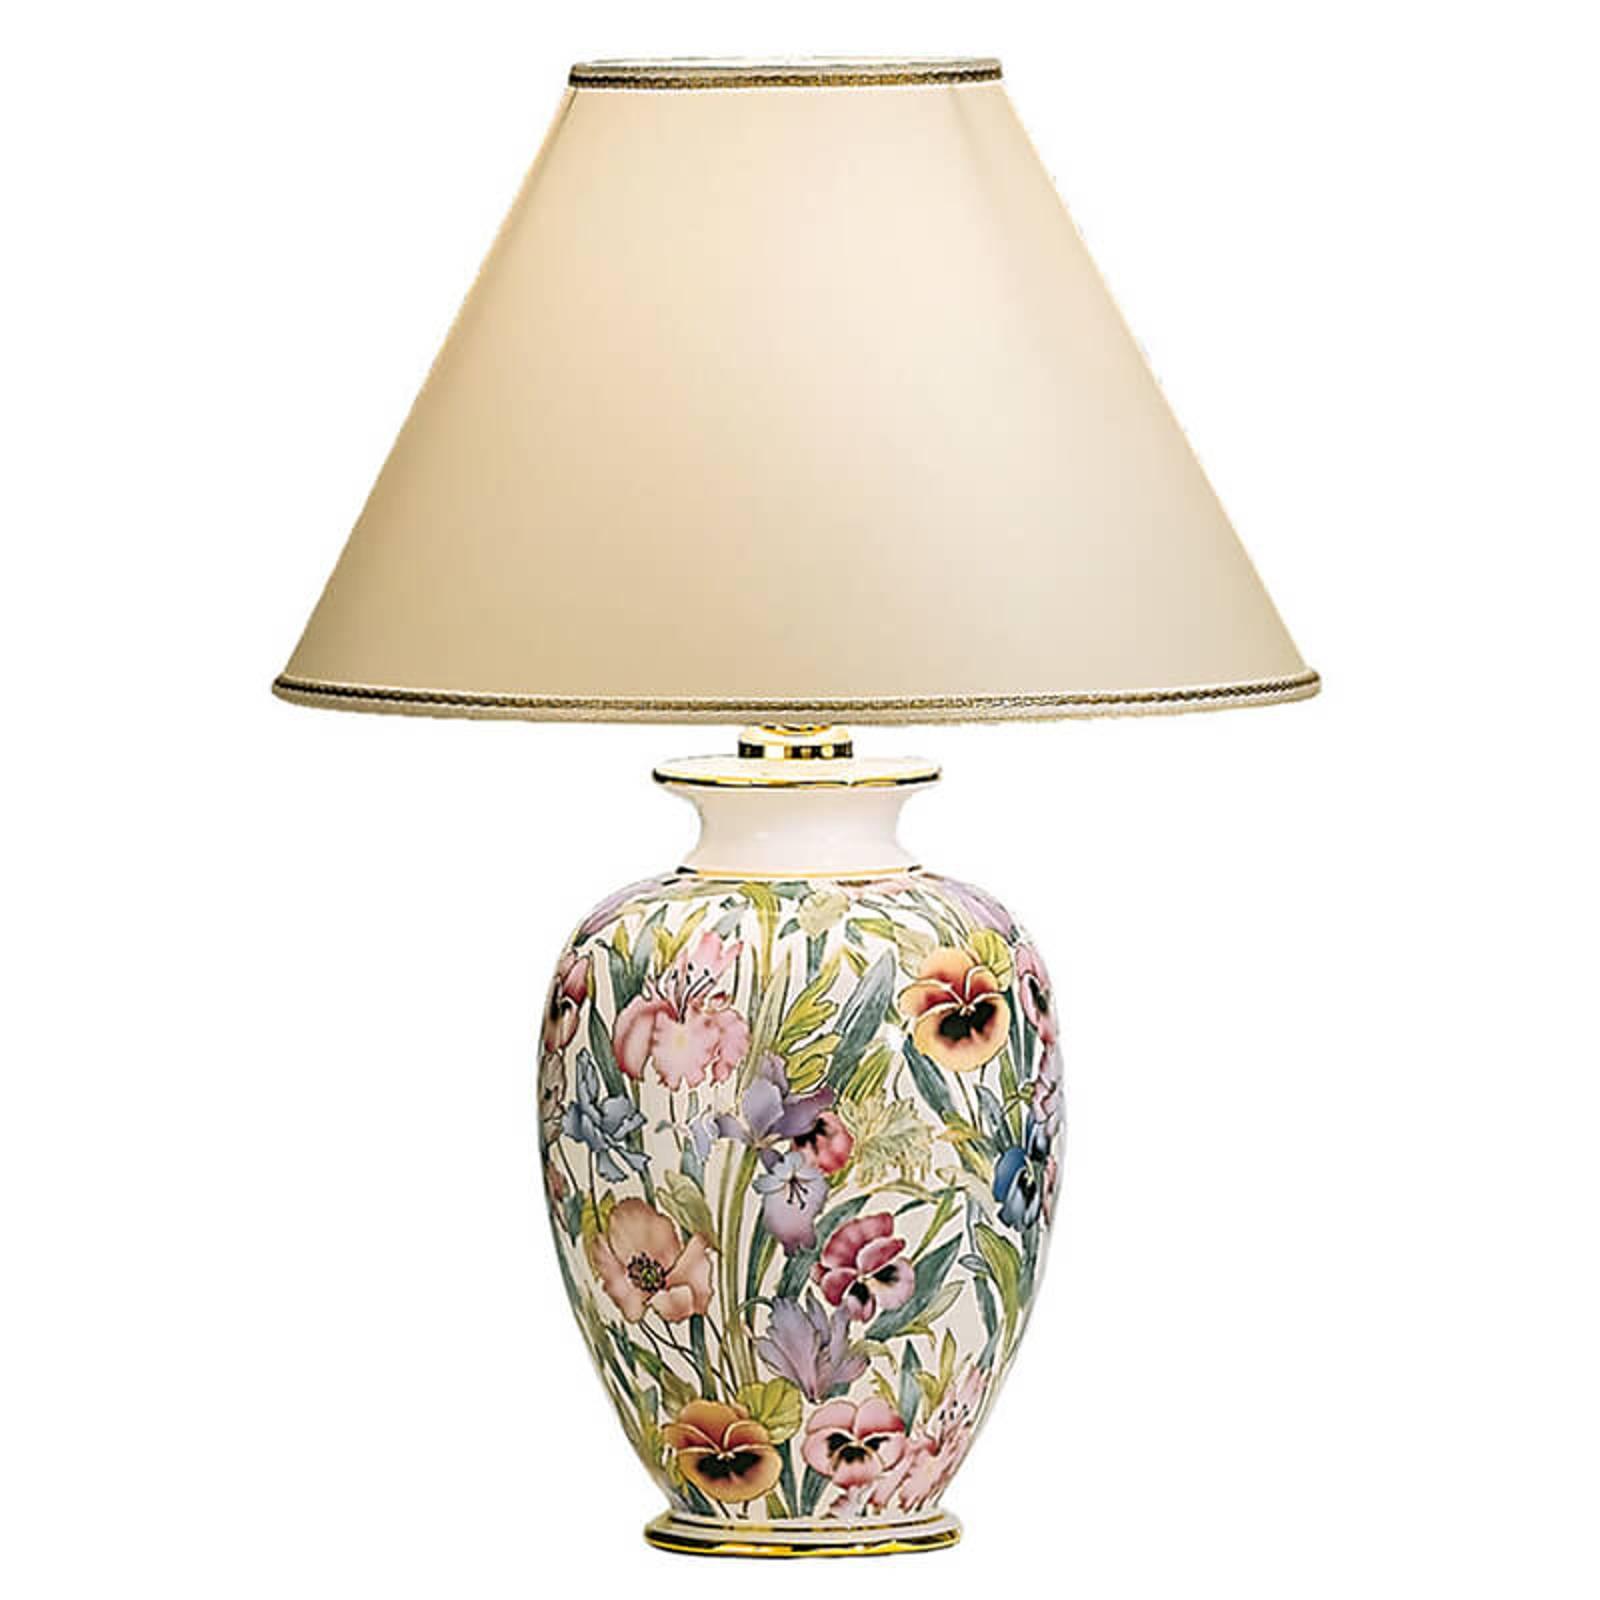 KOLARZ Giardino Panse - floral tafellamp 30 cm